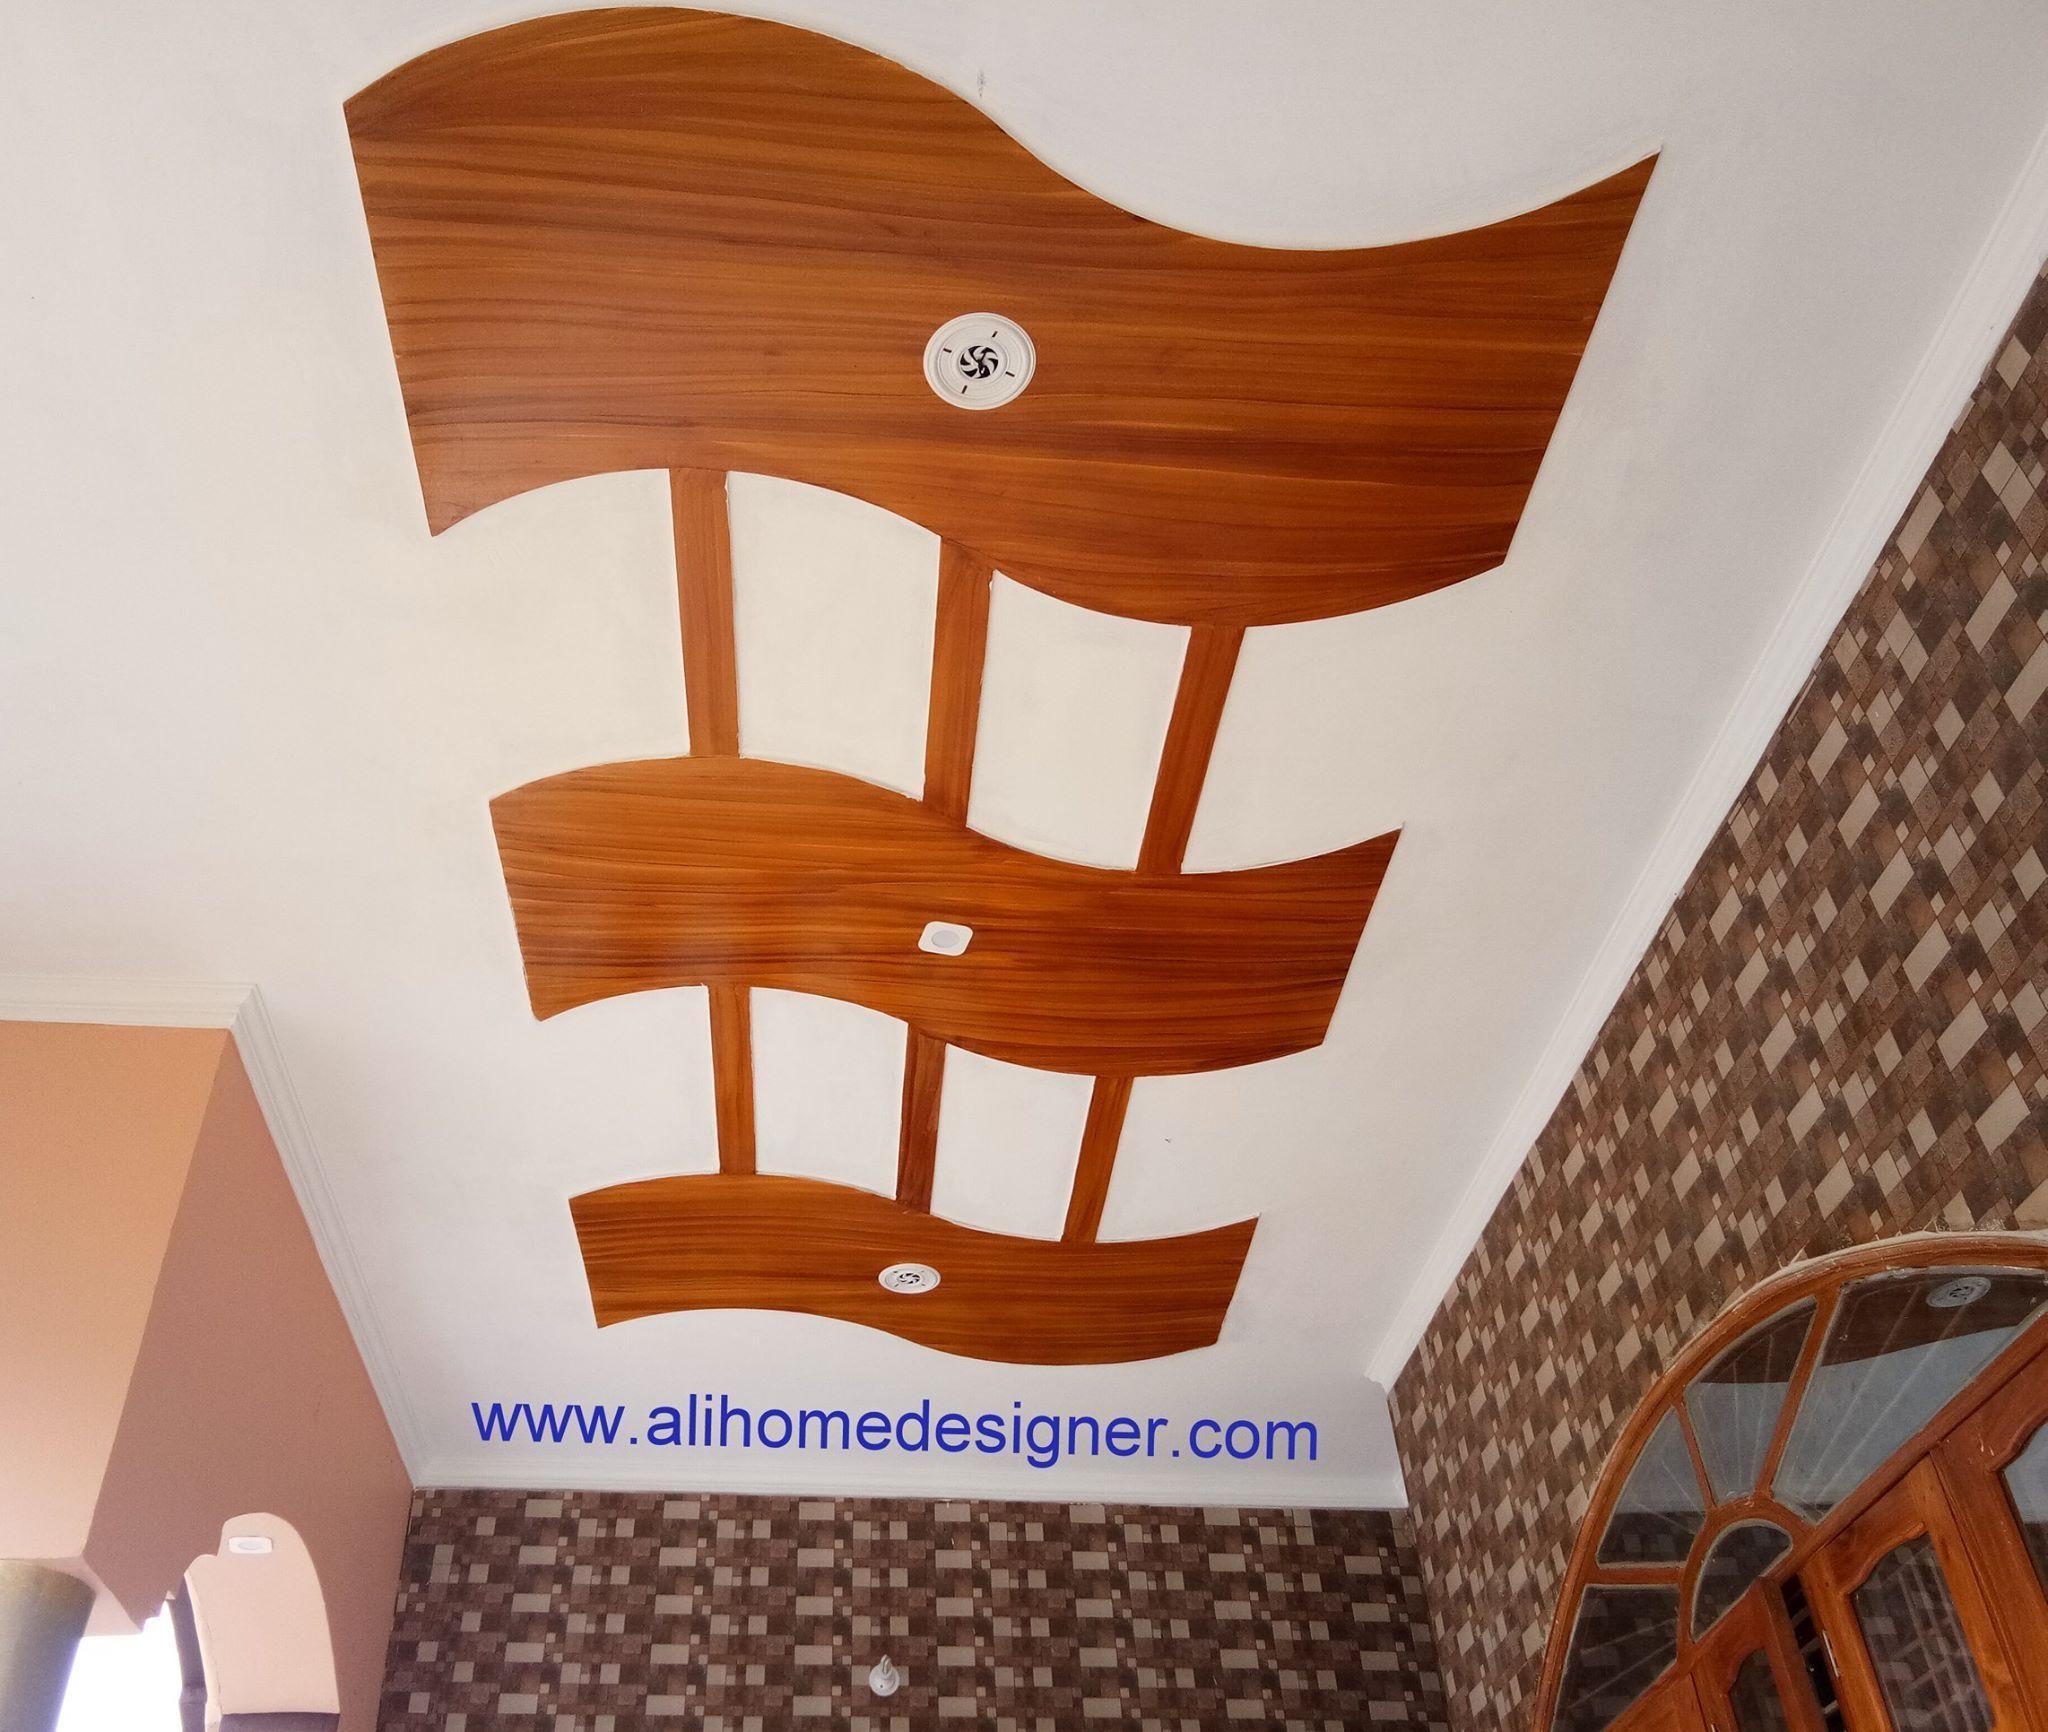 Pop Plus Minus Design Pop Ceiling Design Pop Design For Roof Ceiling Design Bedroom